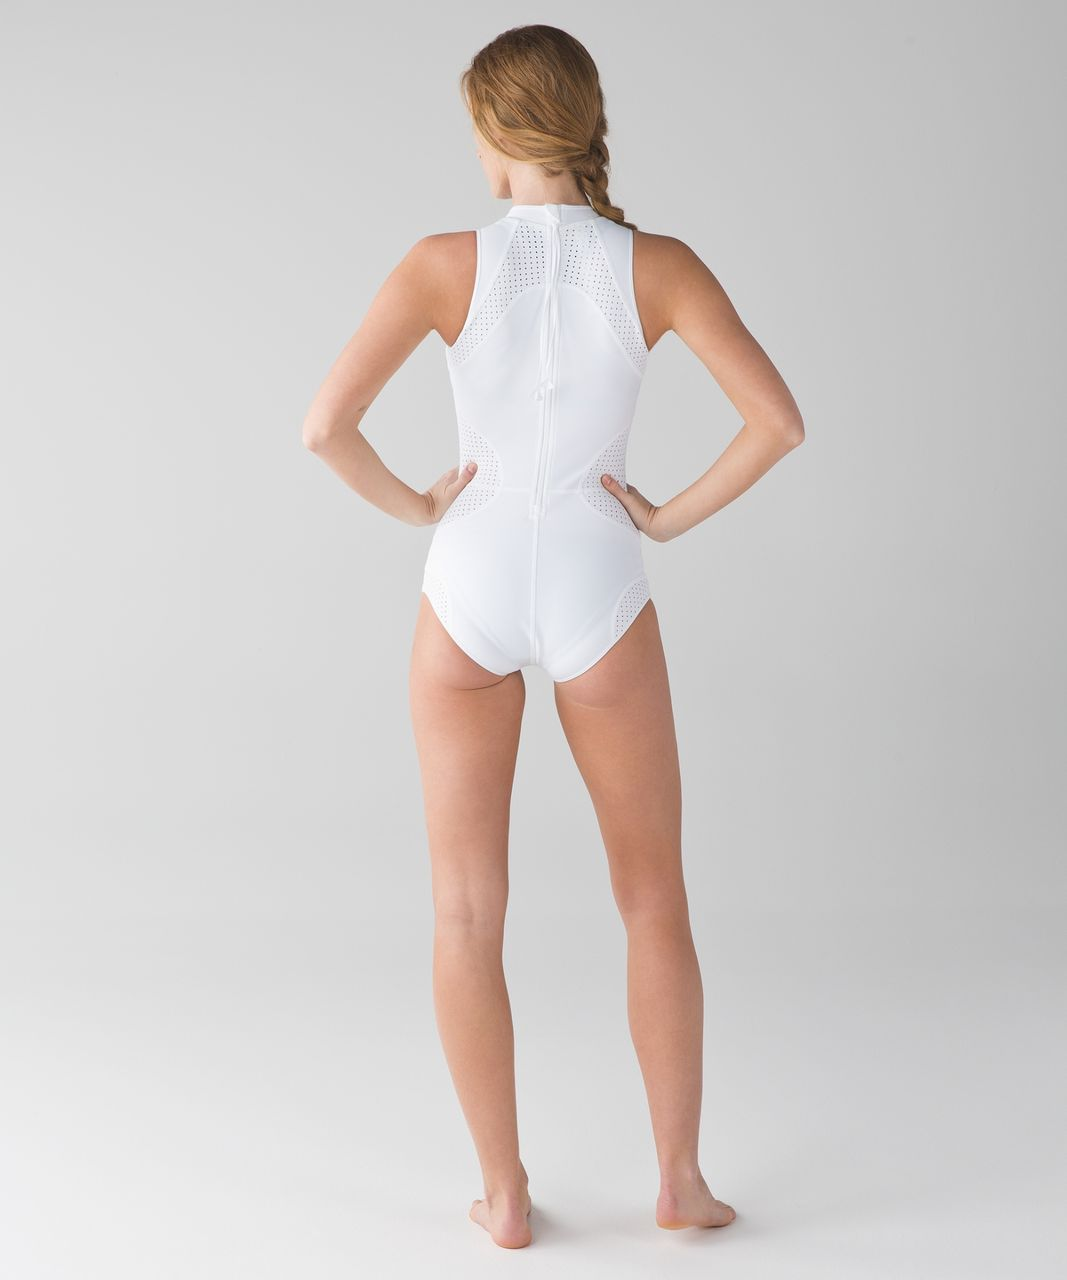 Lululemon Perf-ect Paddle Suit - White